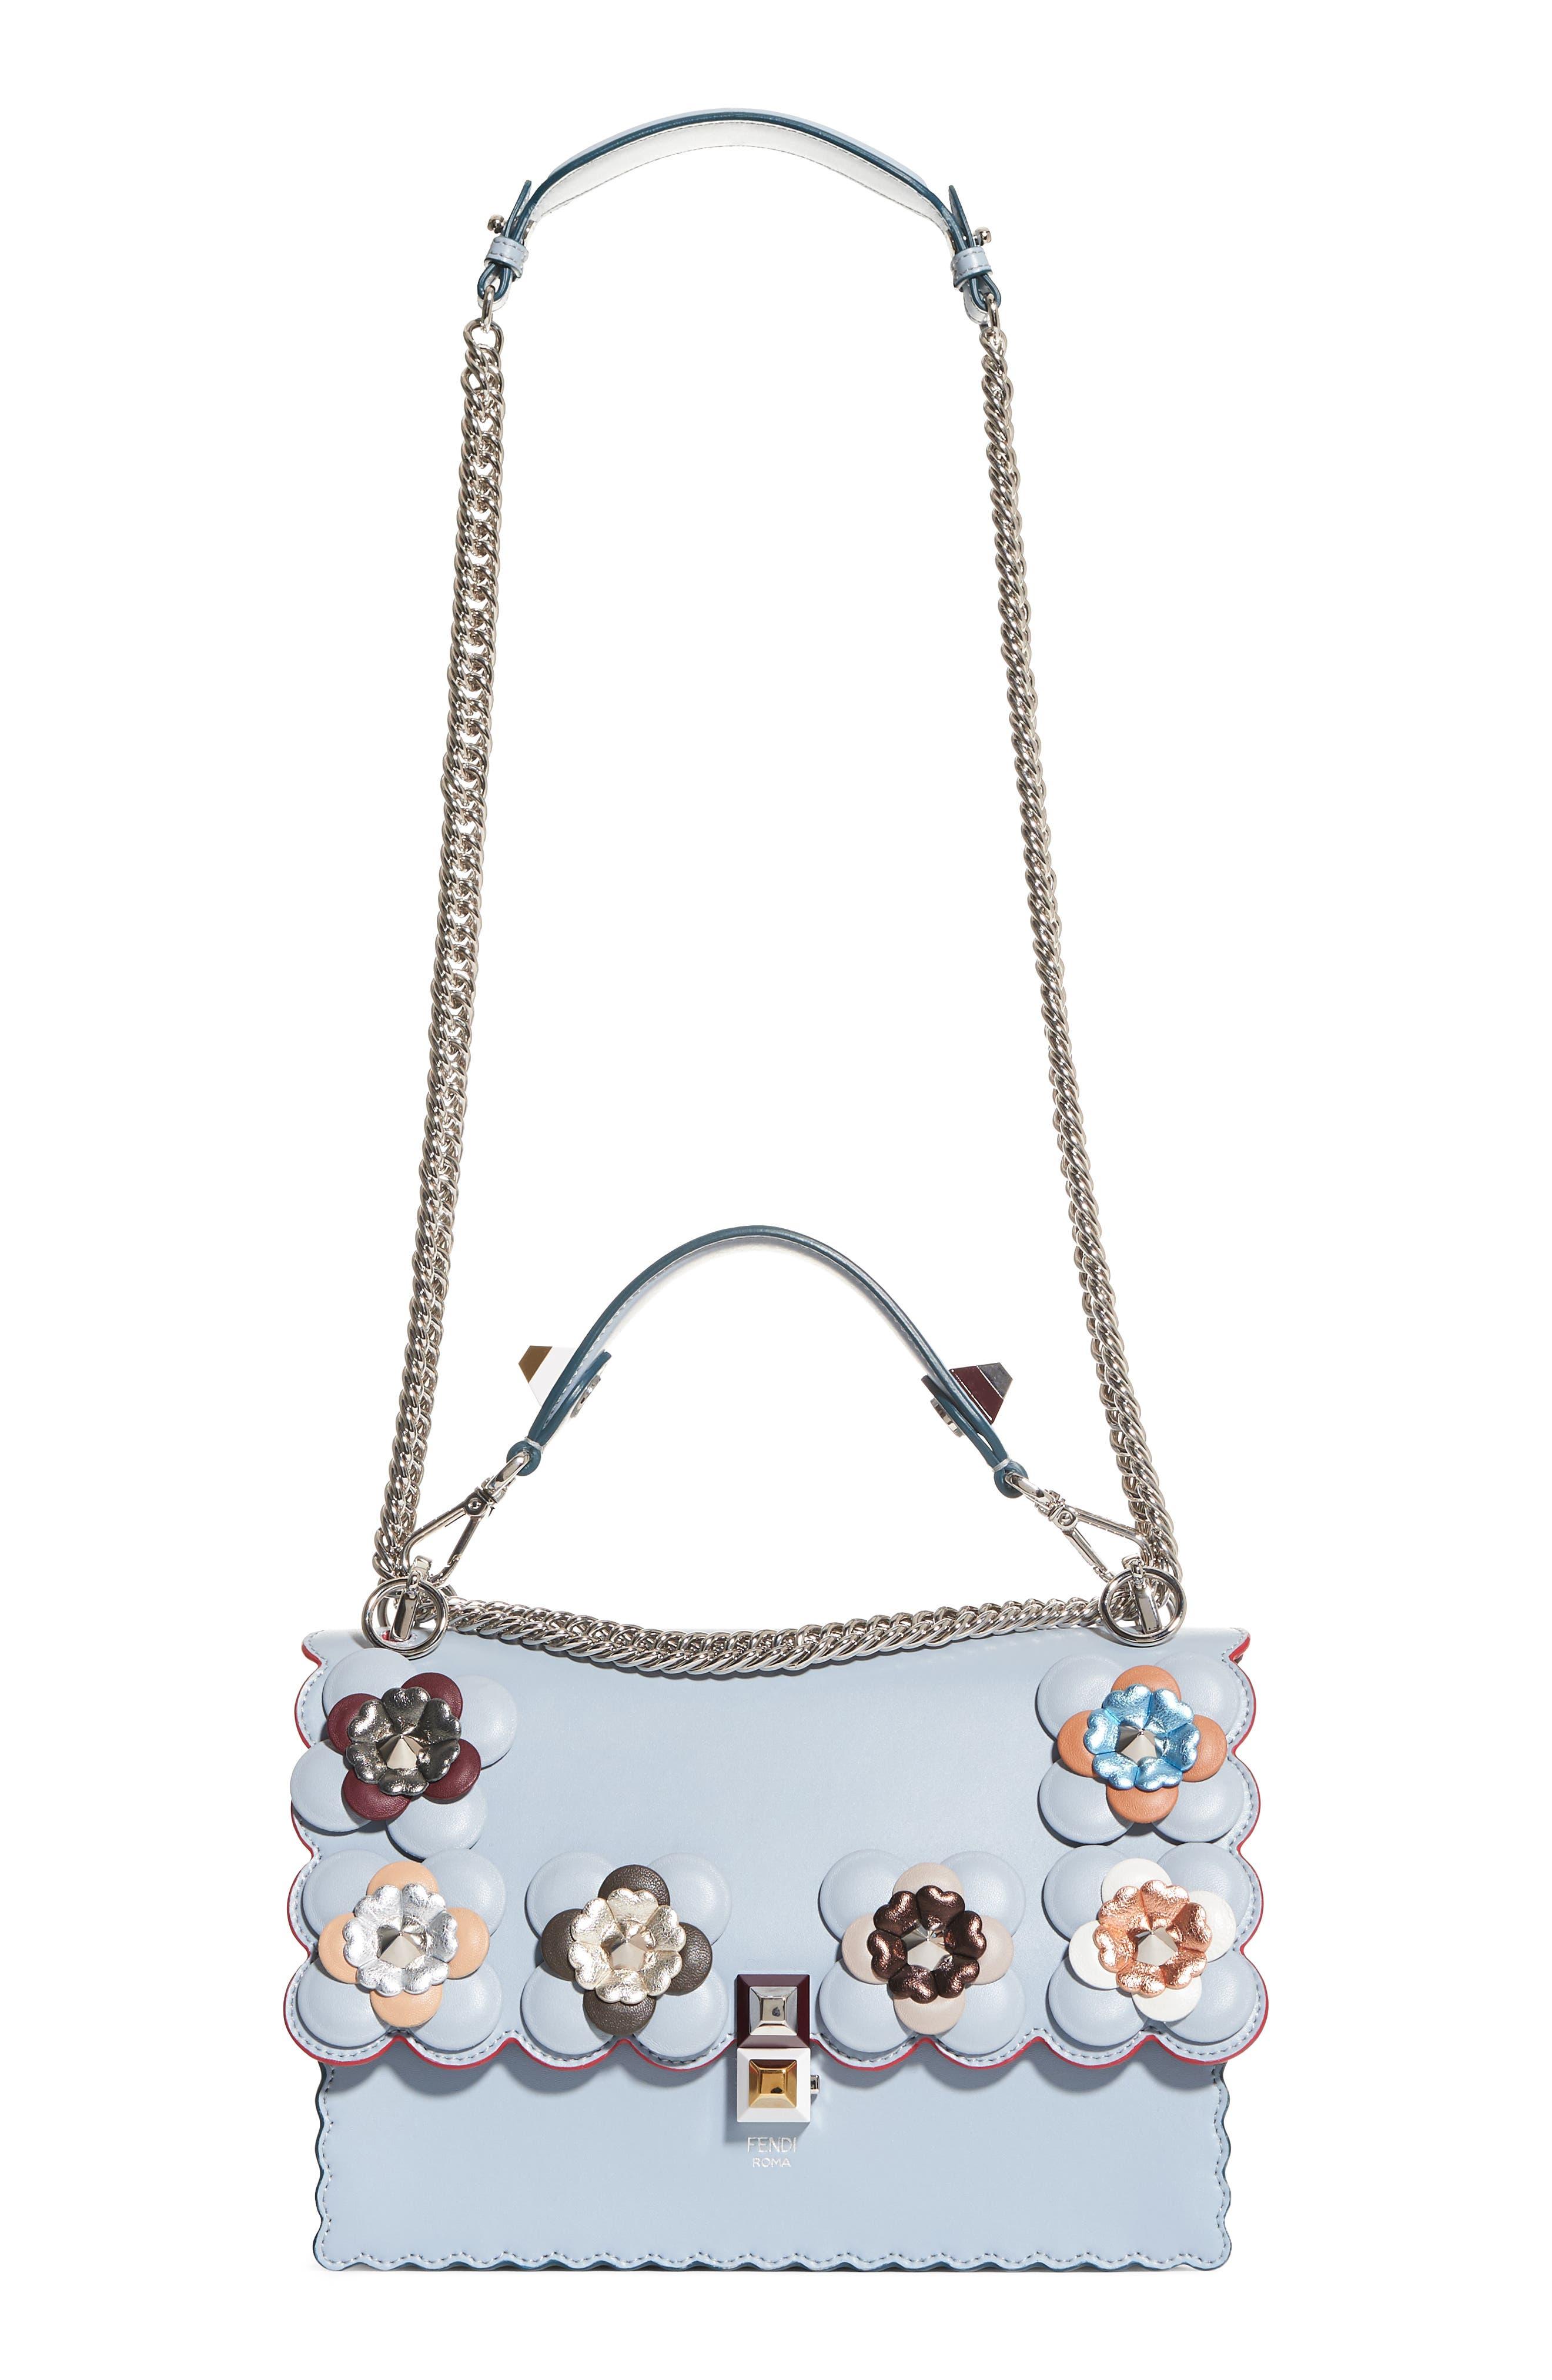 Main Image - Fendi Kan I Liberty Leather Shoulder Bag